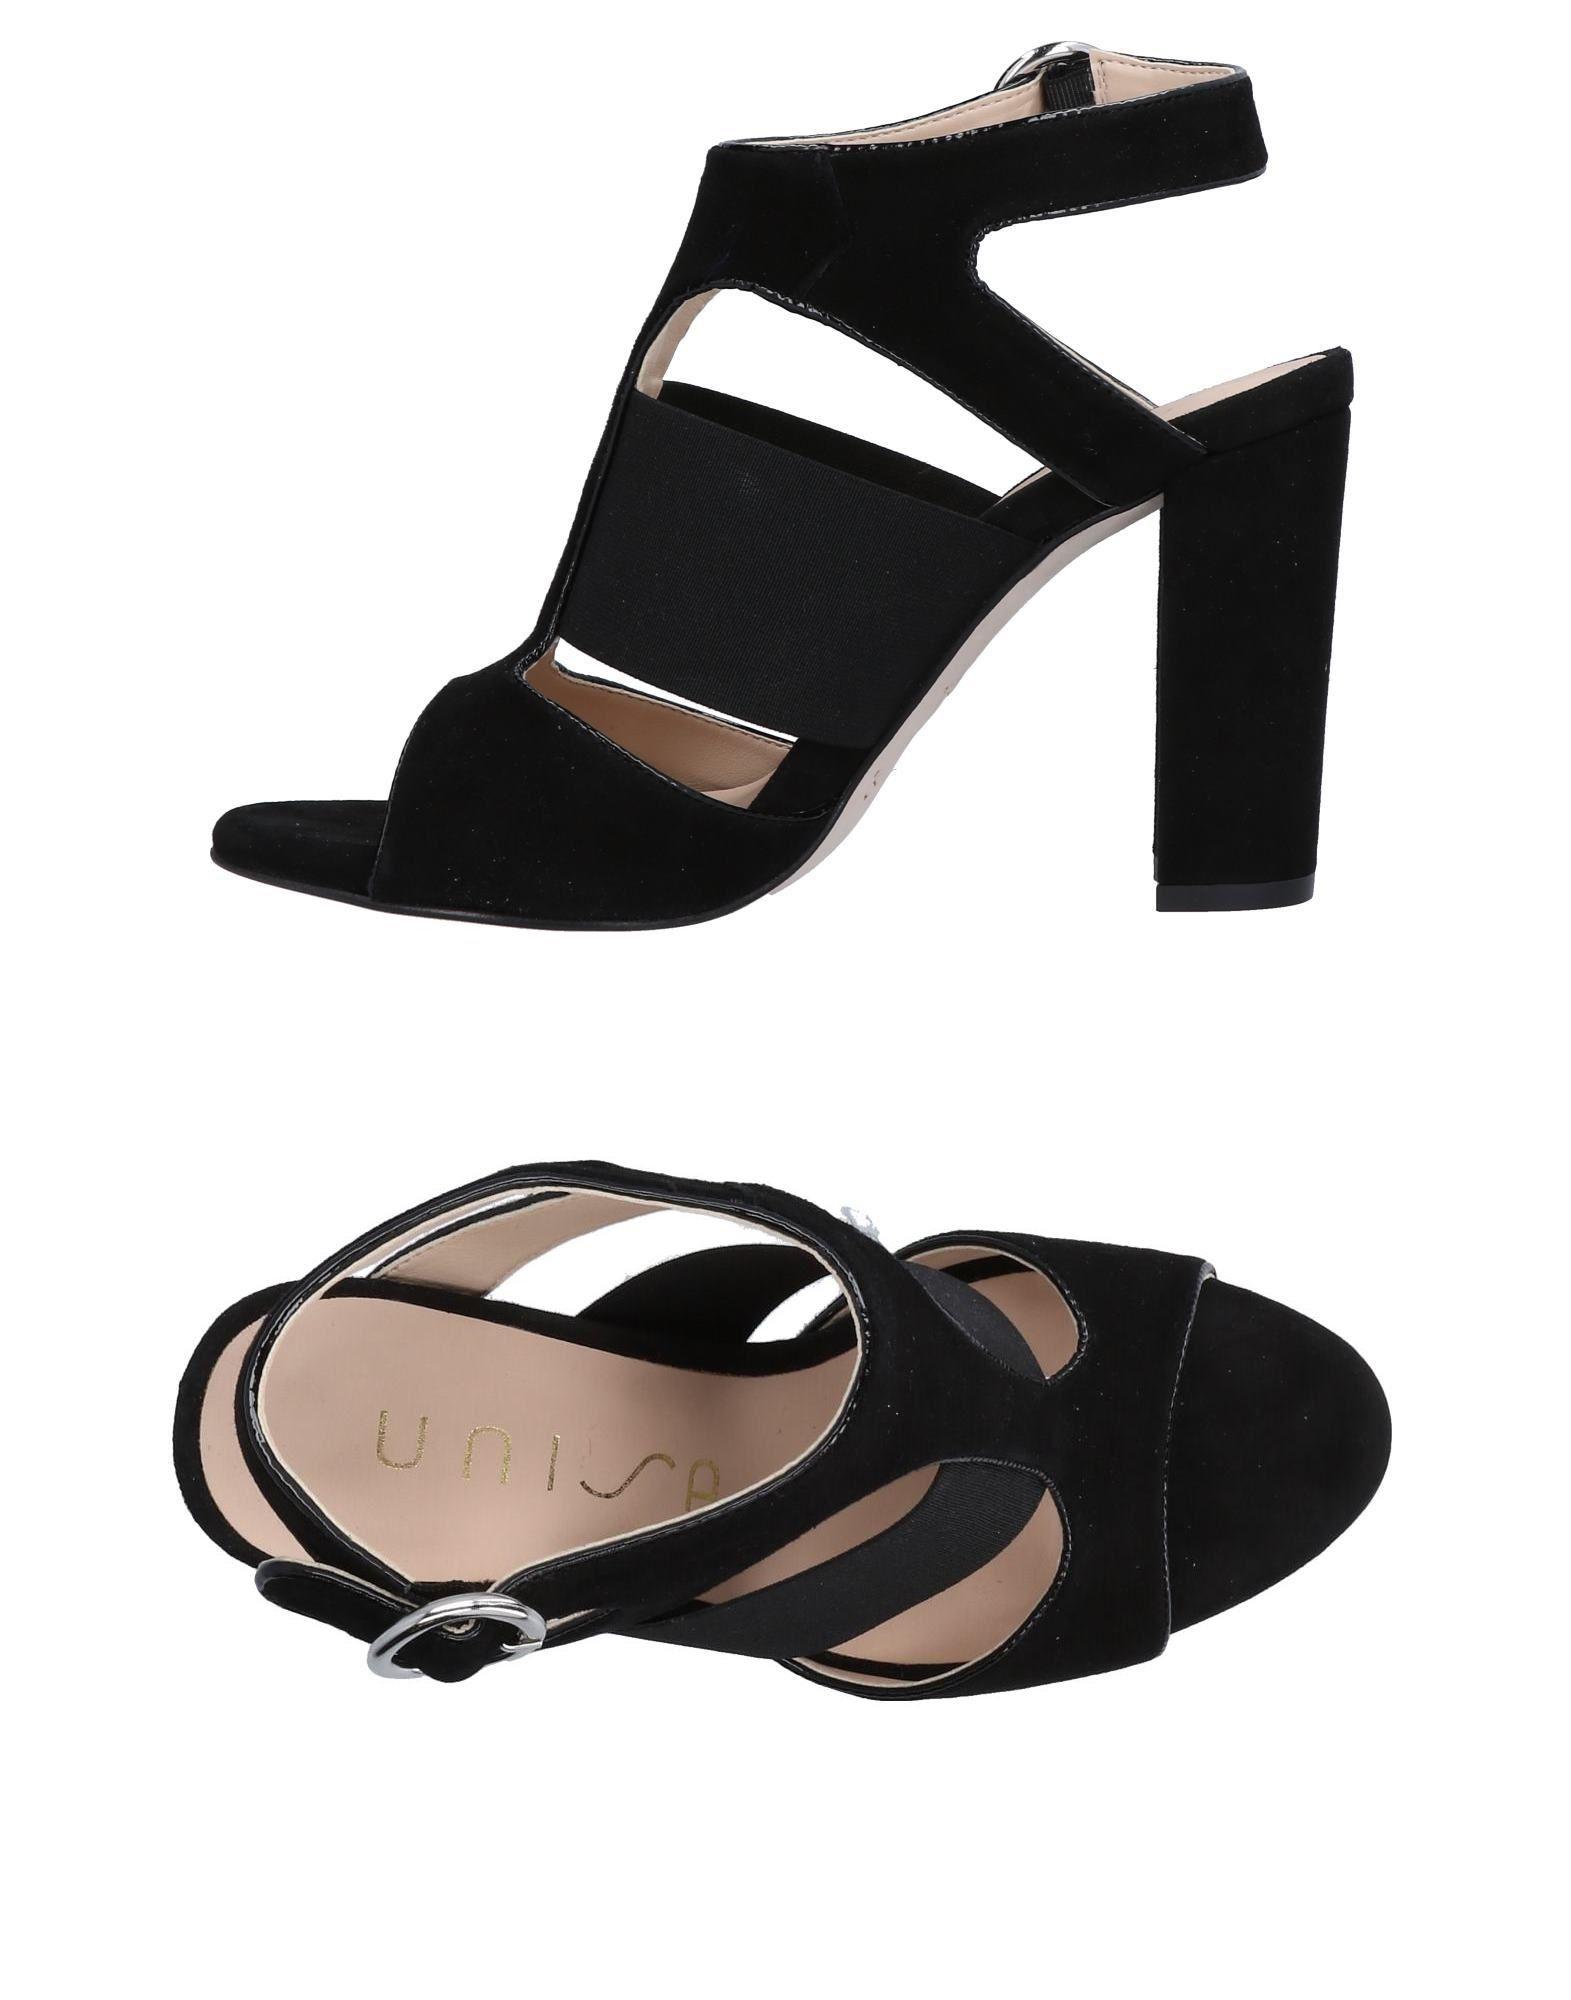 cc1917d90d3 Unisa Sandals - Women Unisa Unisa Unisa Sandals online on Canada -  11505484KG 2c2cae